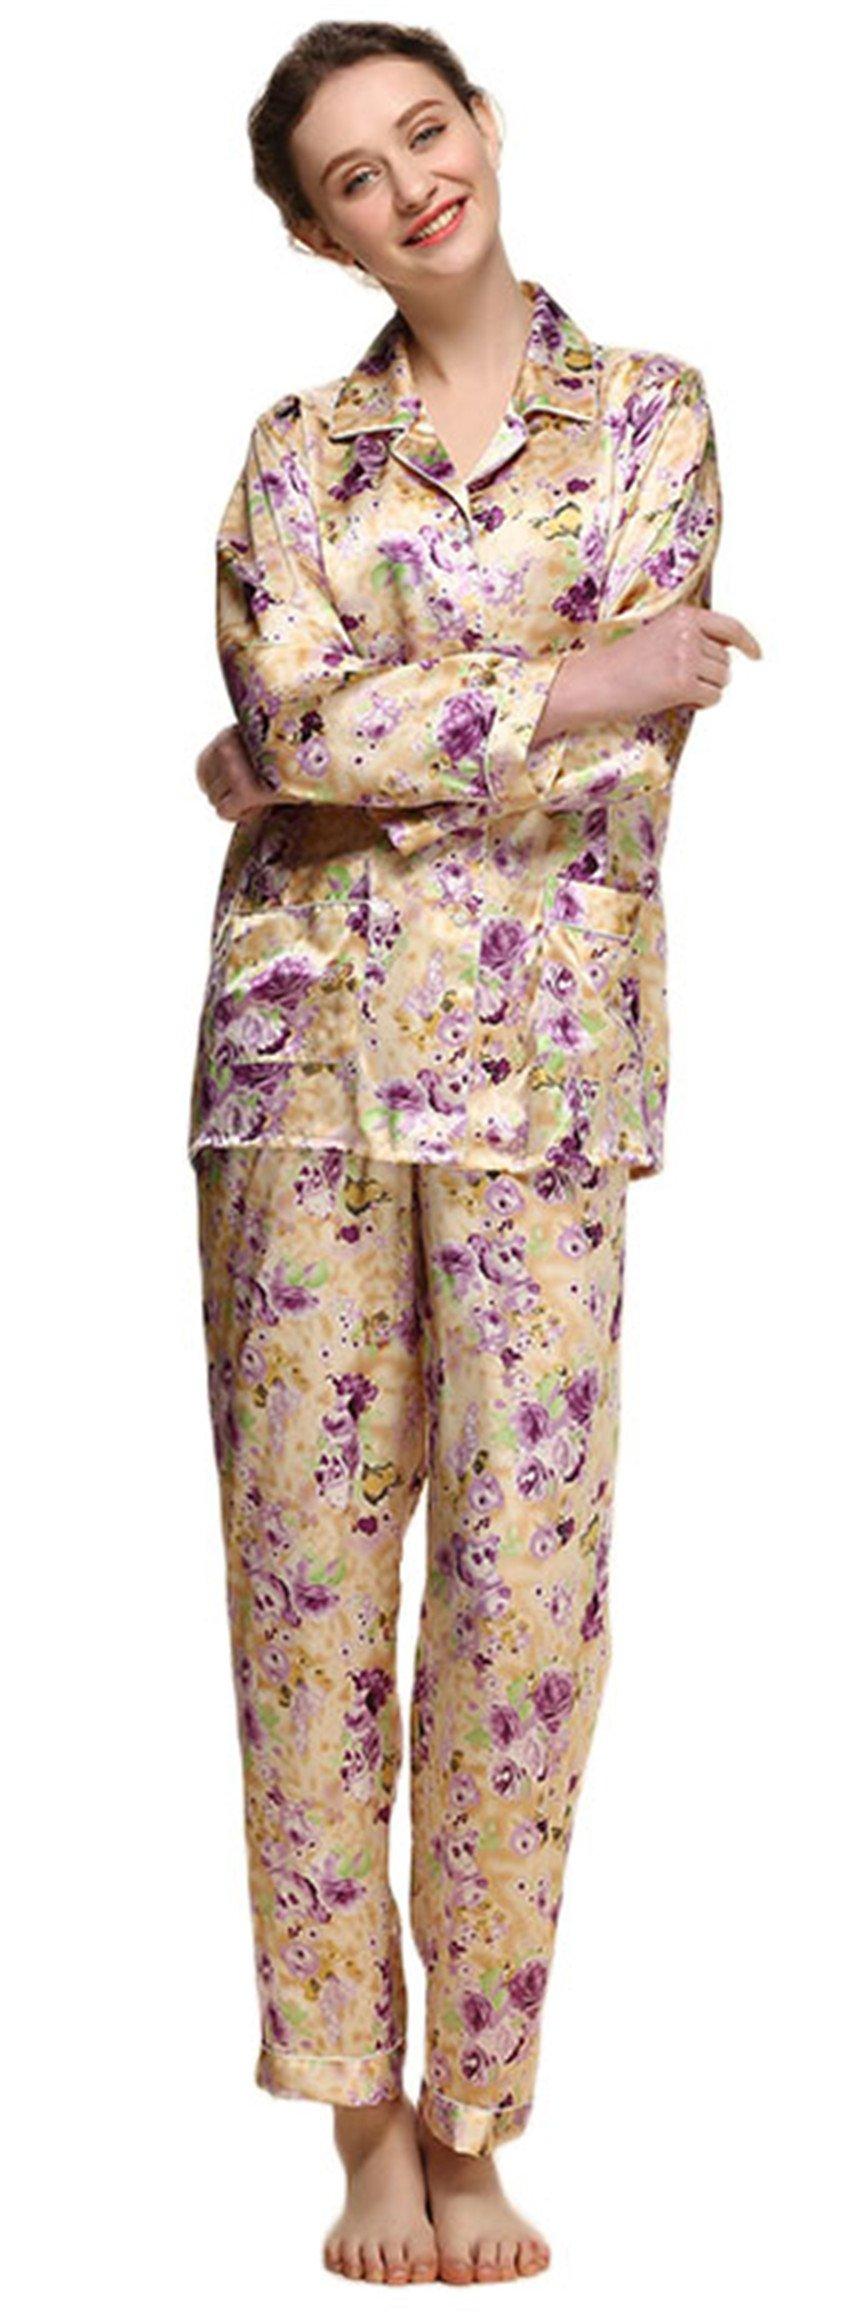 Women's Pure Mulberry Silk Pajama Set Long Sleeve Printed Floral Classic Luxury Sleepwear XL